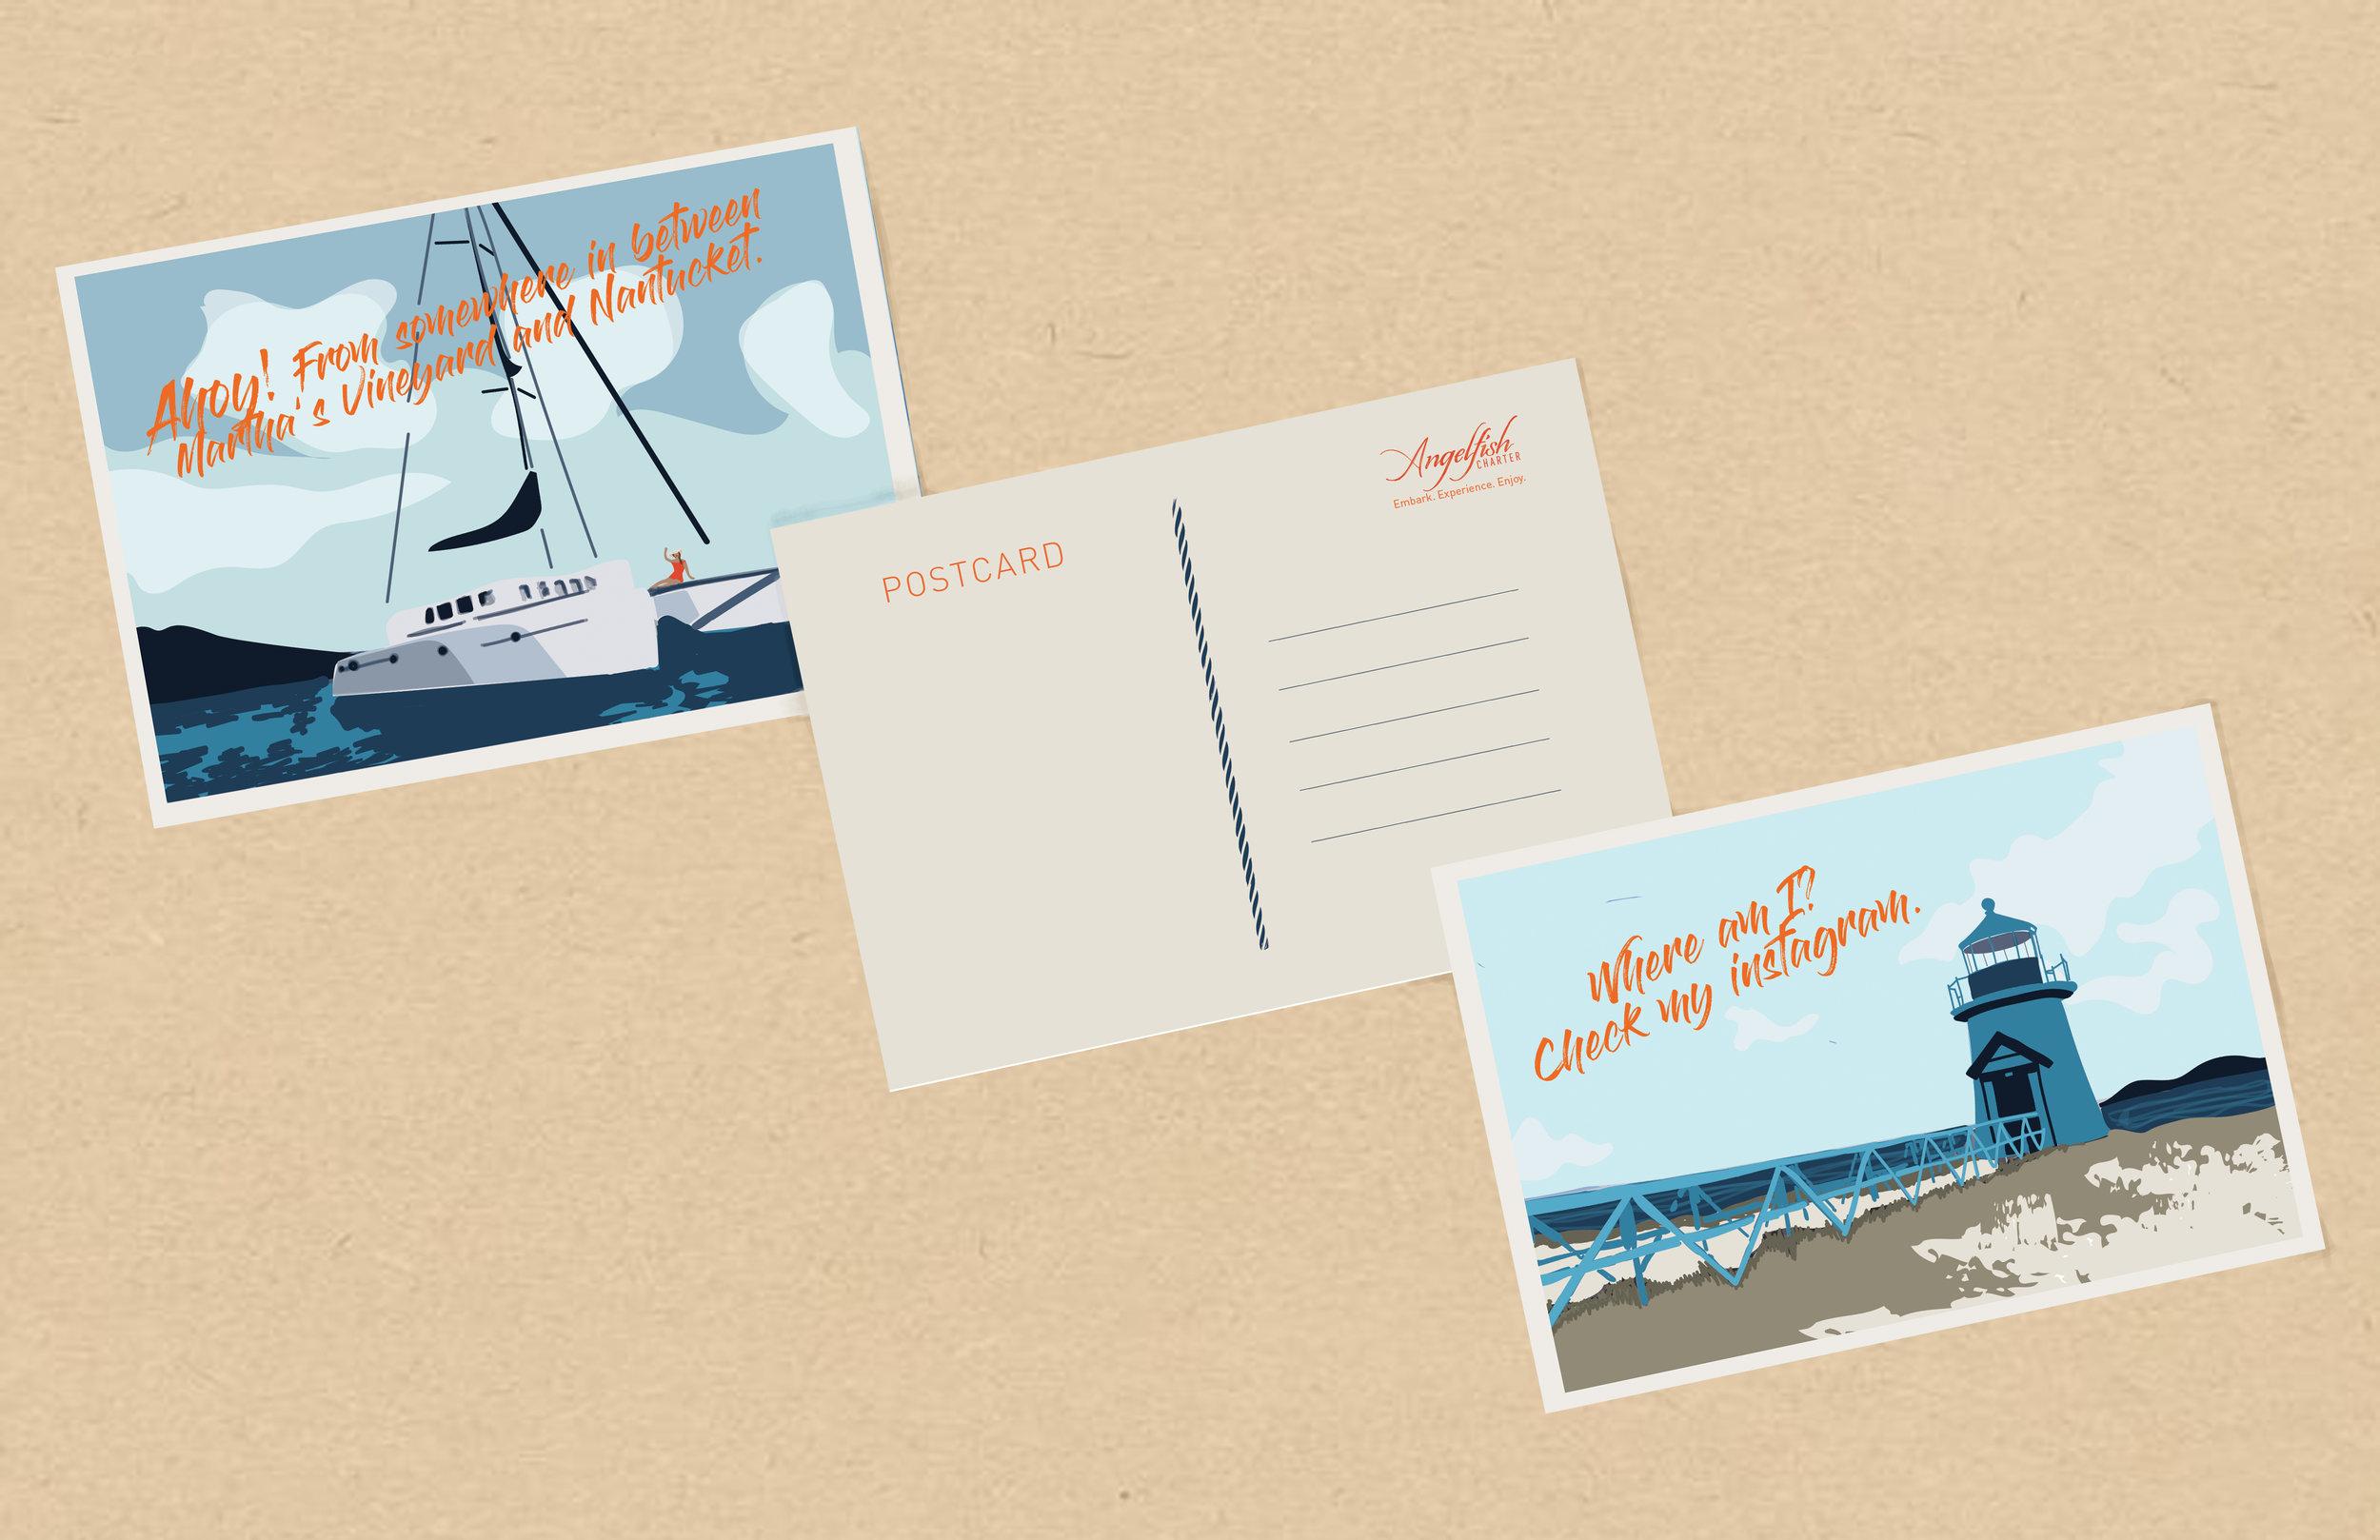 angelfish poscards placement2.jpg